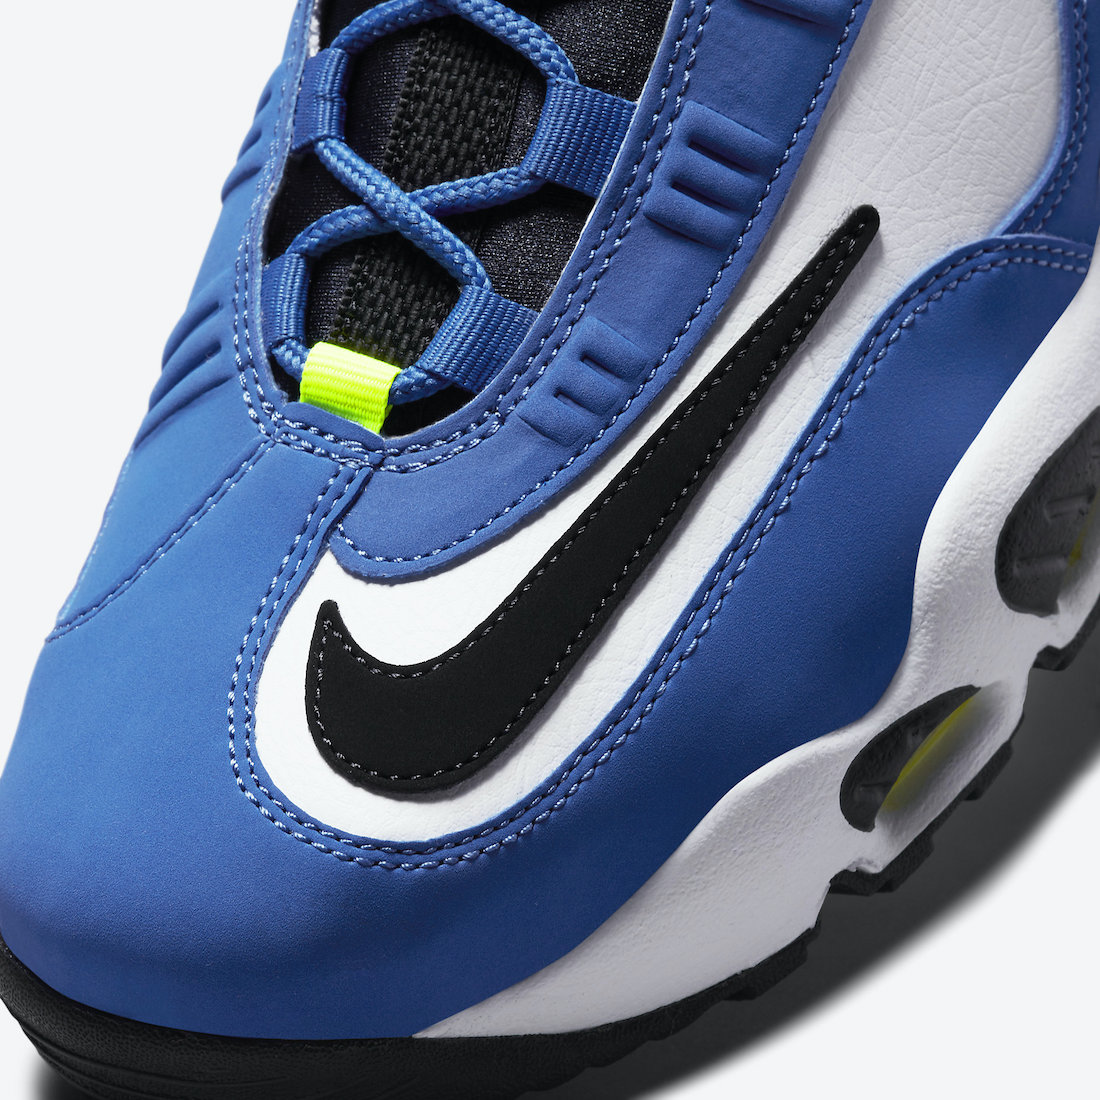 Nike-Air-Griffey-Max-1-Varsity-Royal-DJ5161-400-2021-Release-Date-6